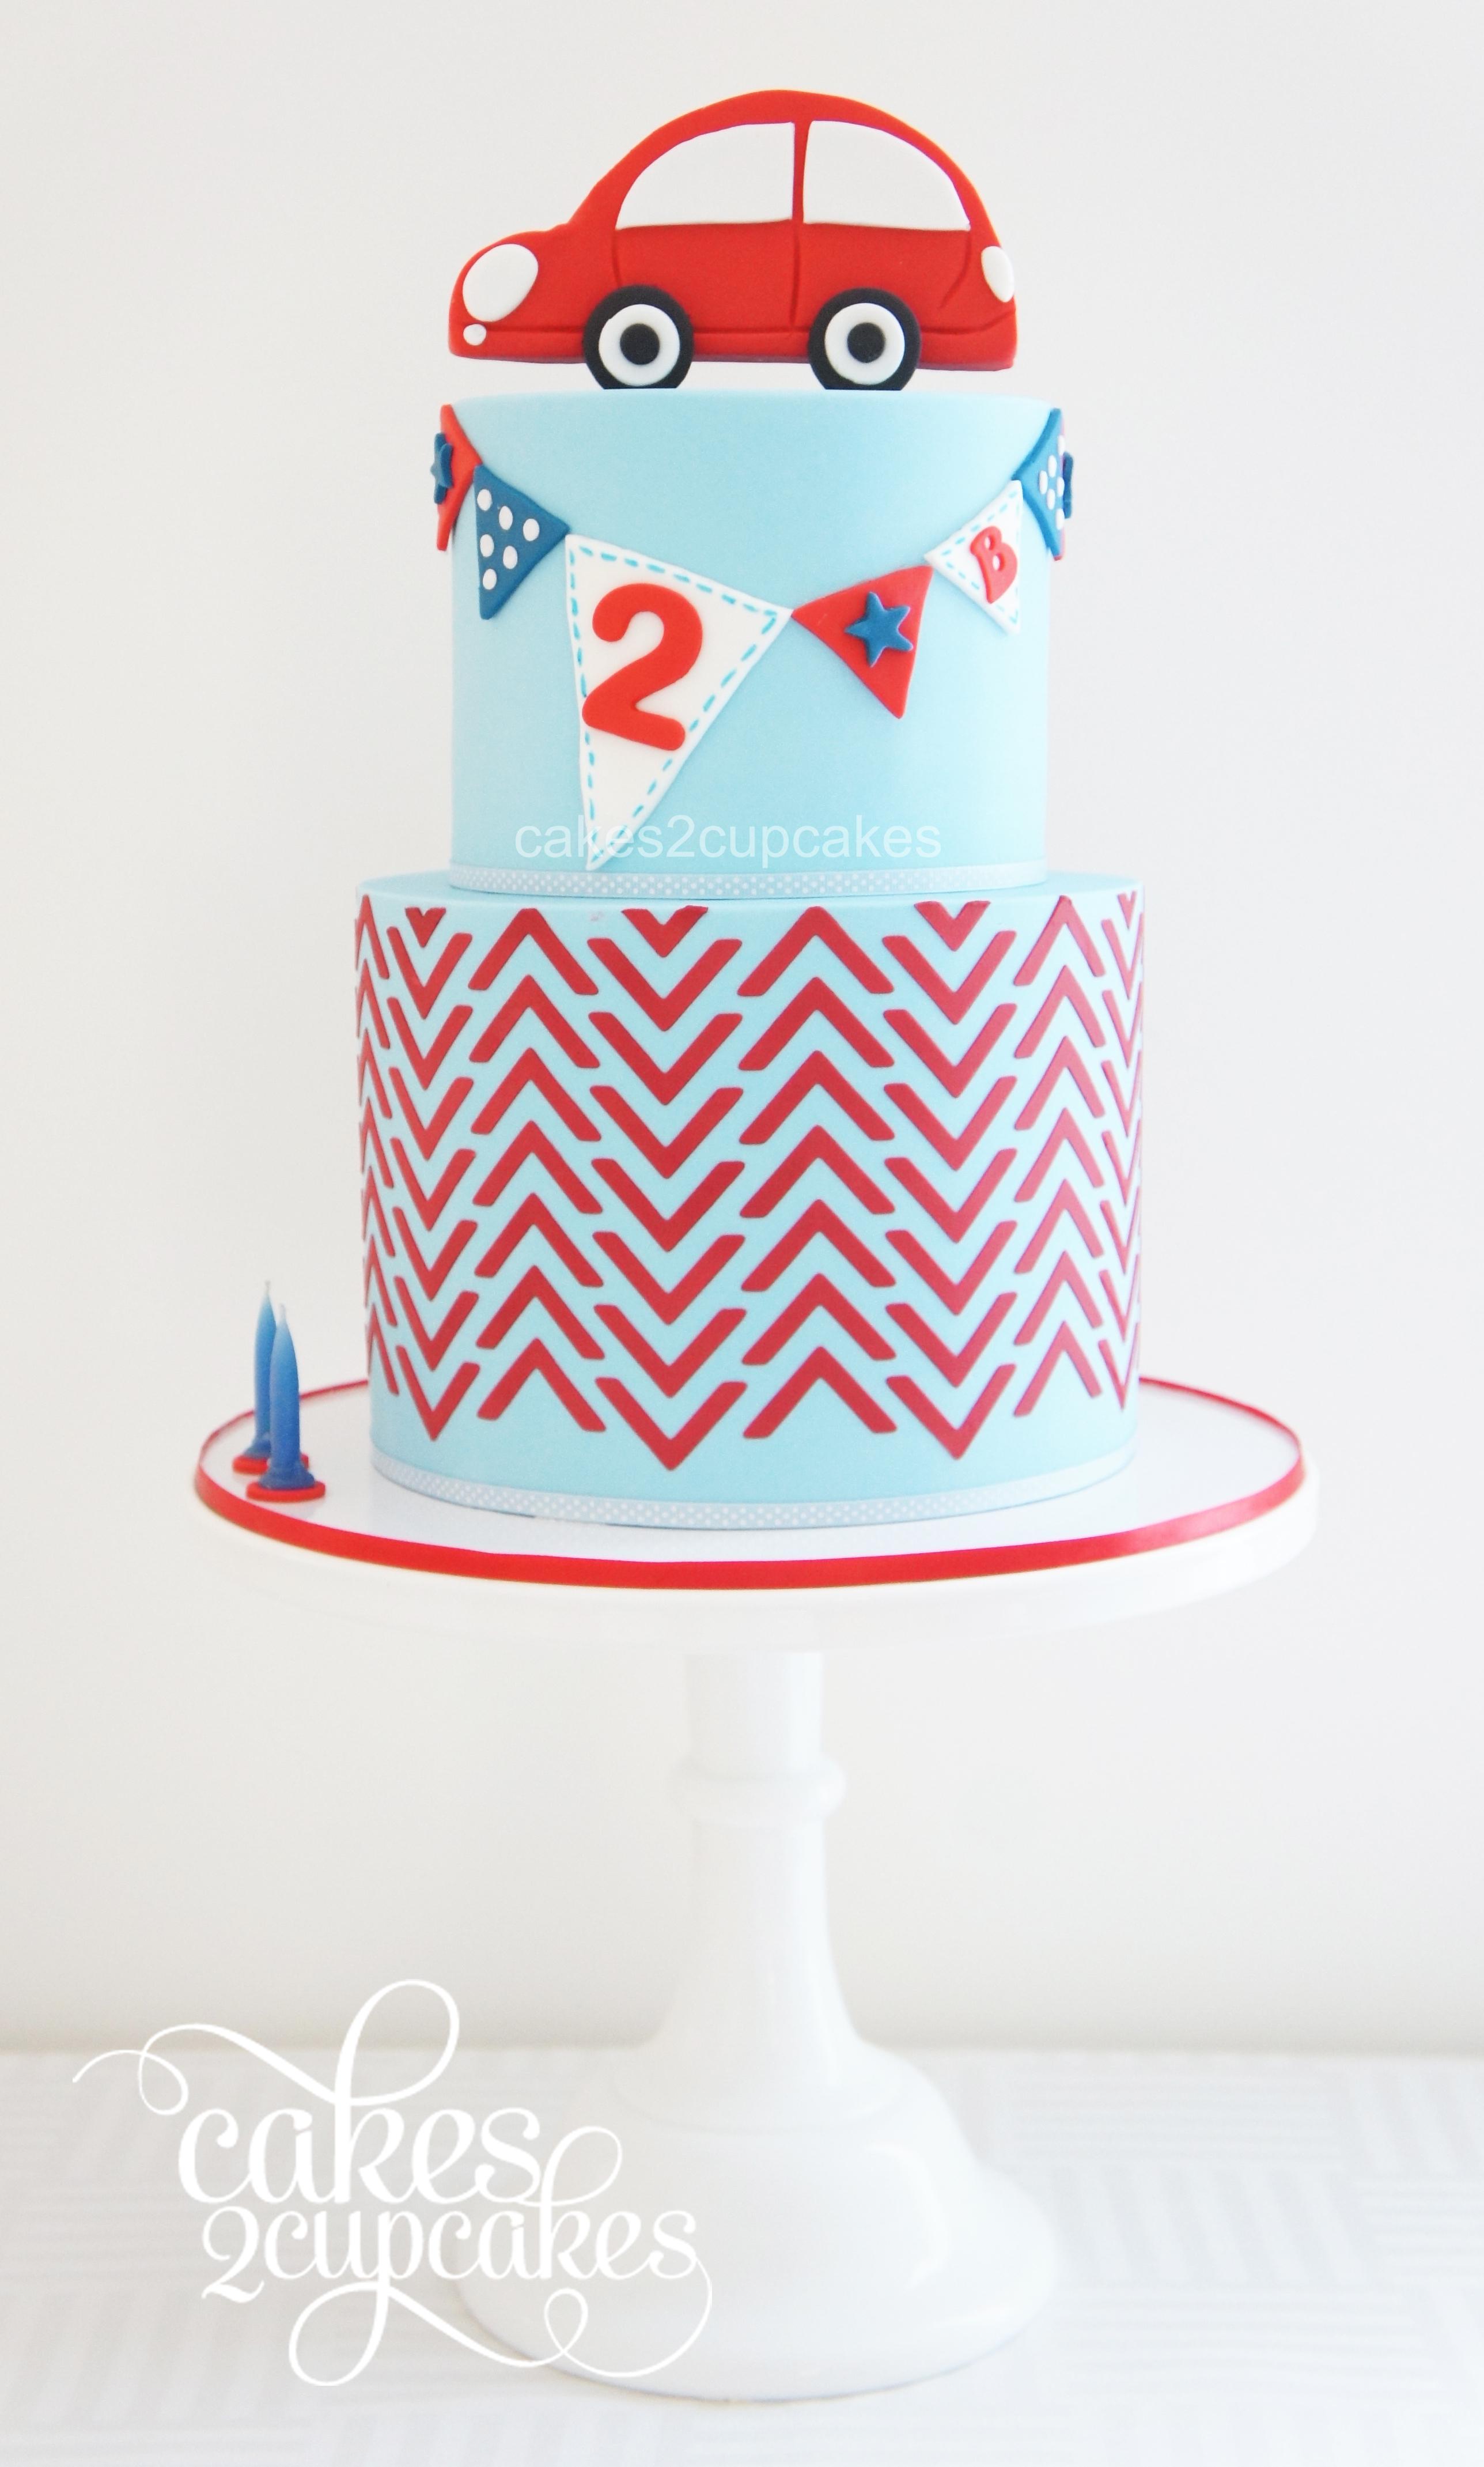 cakes2cupcakes.redcar.jpg